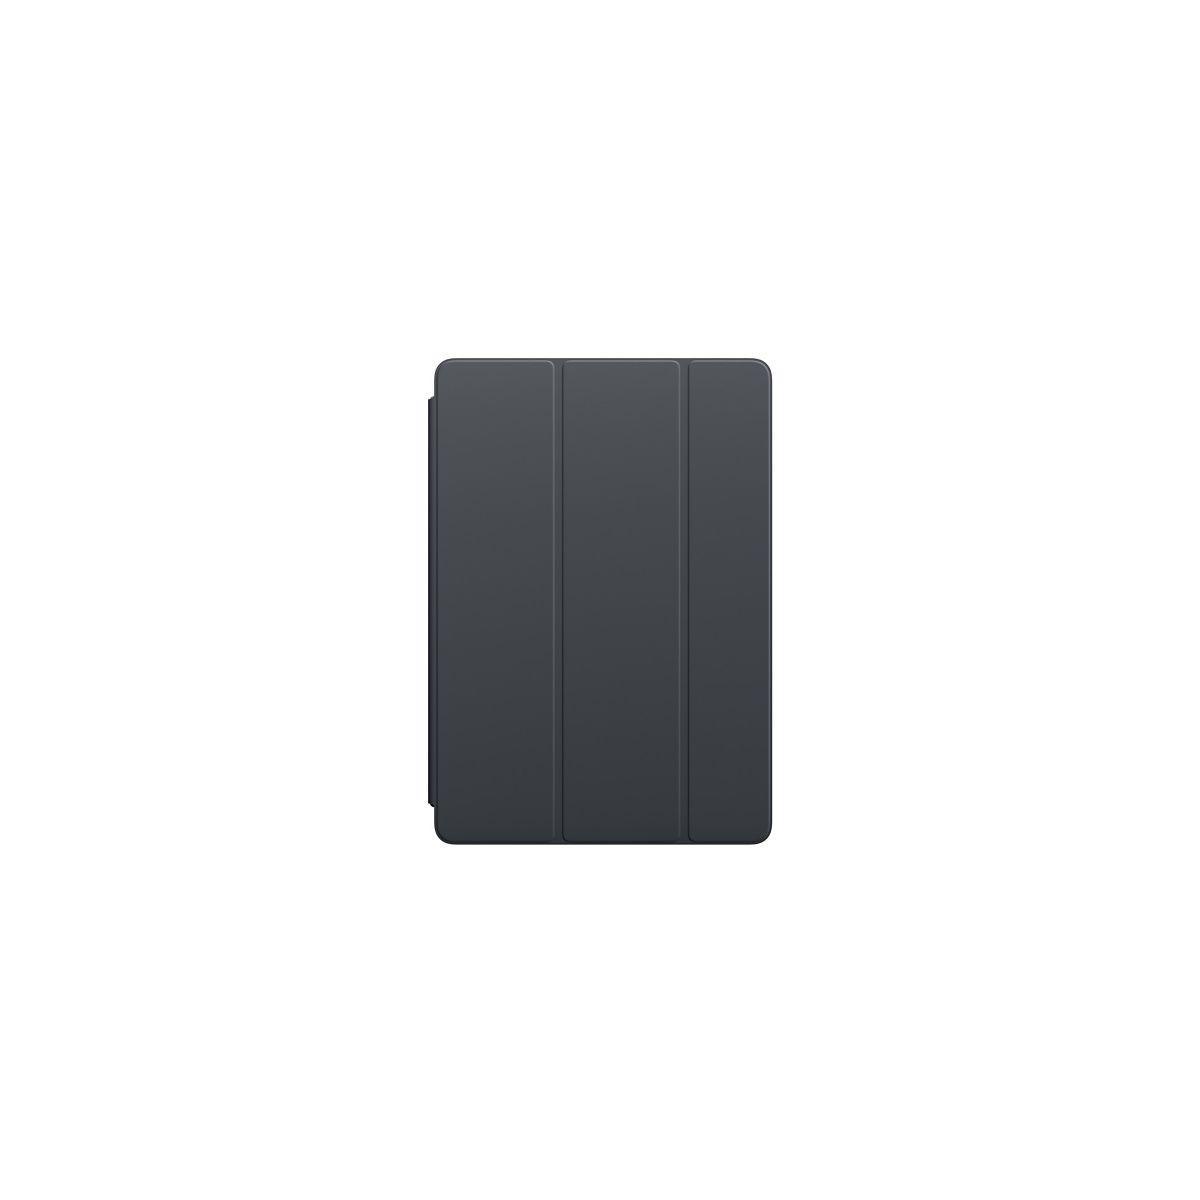 Etui tablette apple smart cover ipad pro 10.5 gris anthracit (photo)